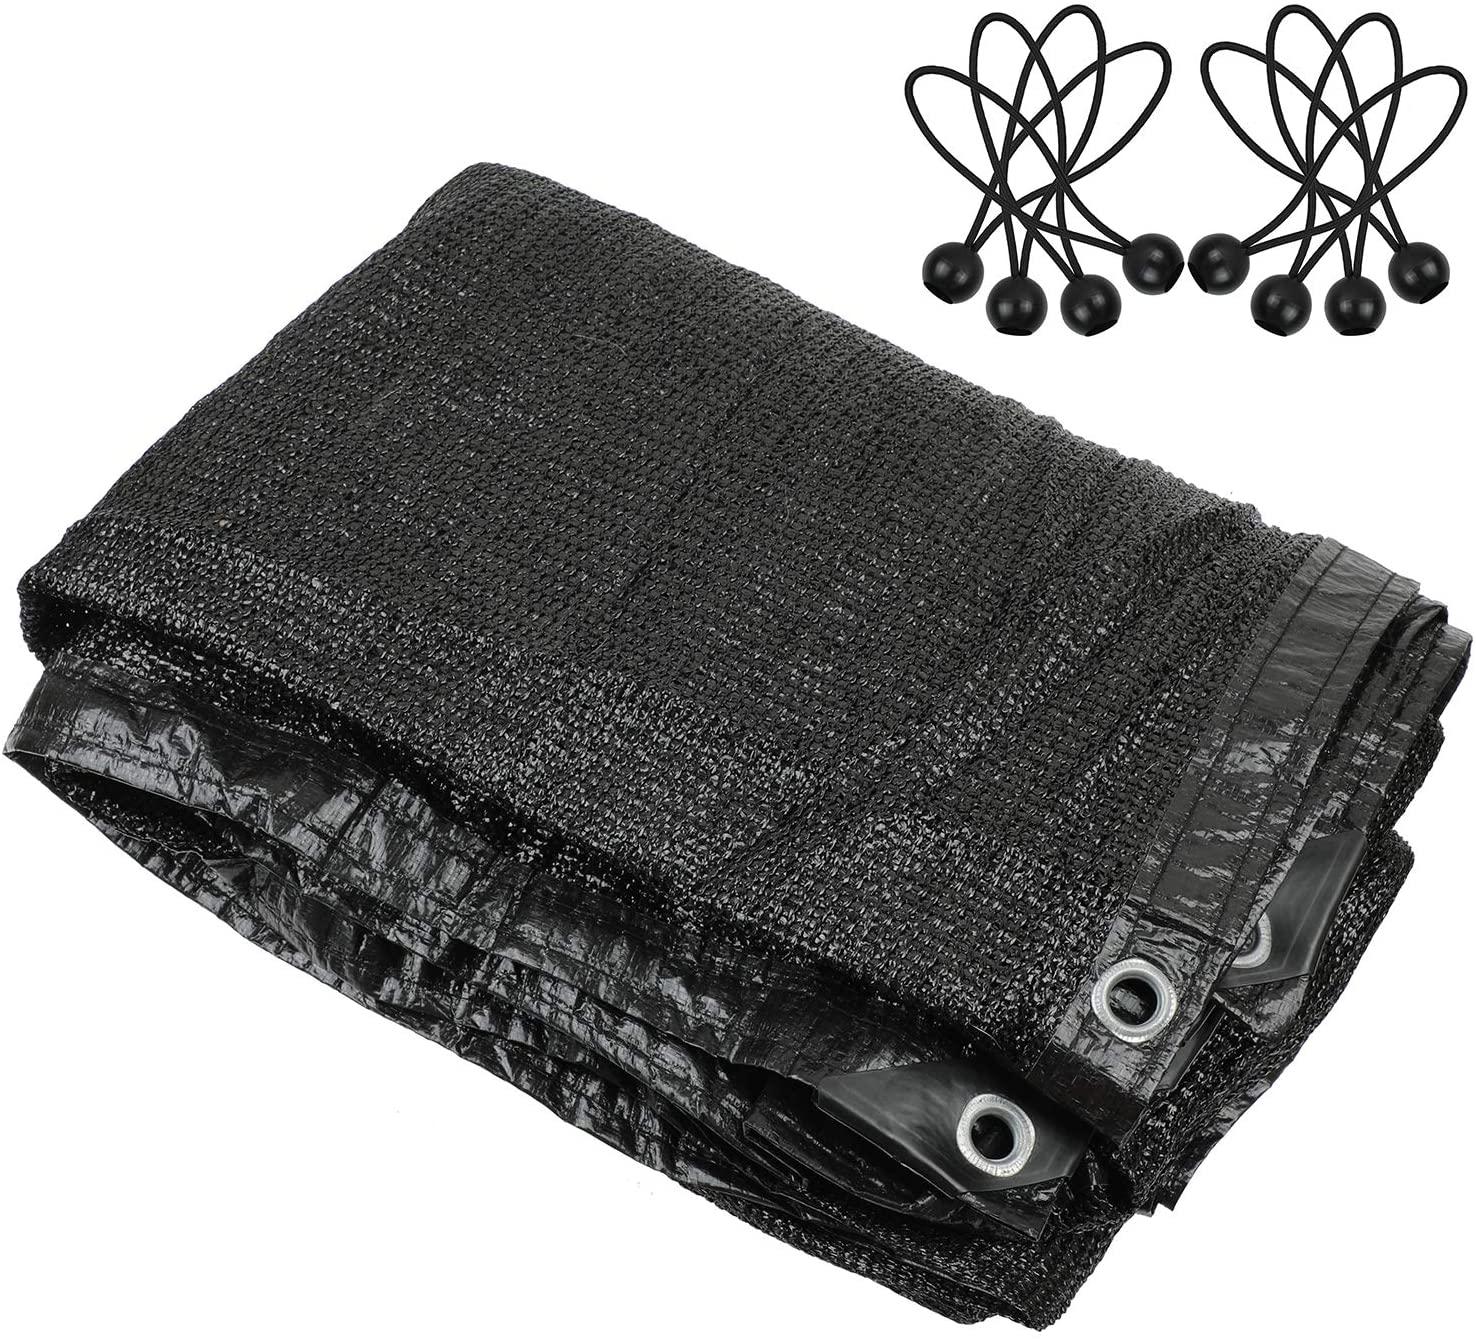 Tela de sombra 80%, tela de sombra, tela de sombra con ojales para cubierta de pérgola, dosel negro